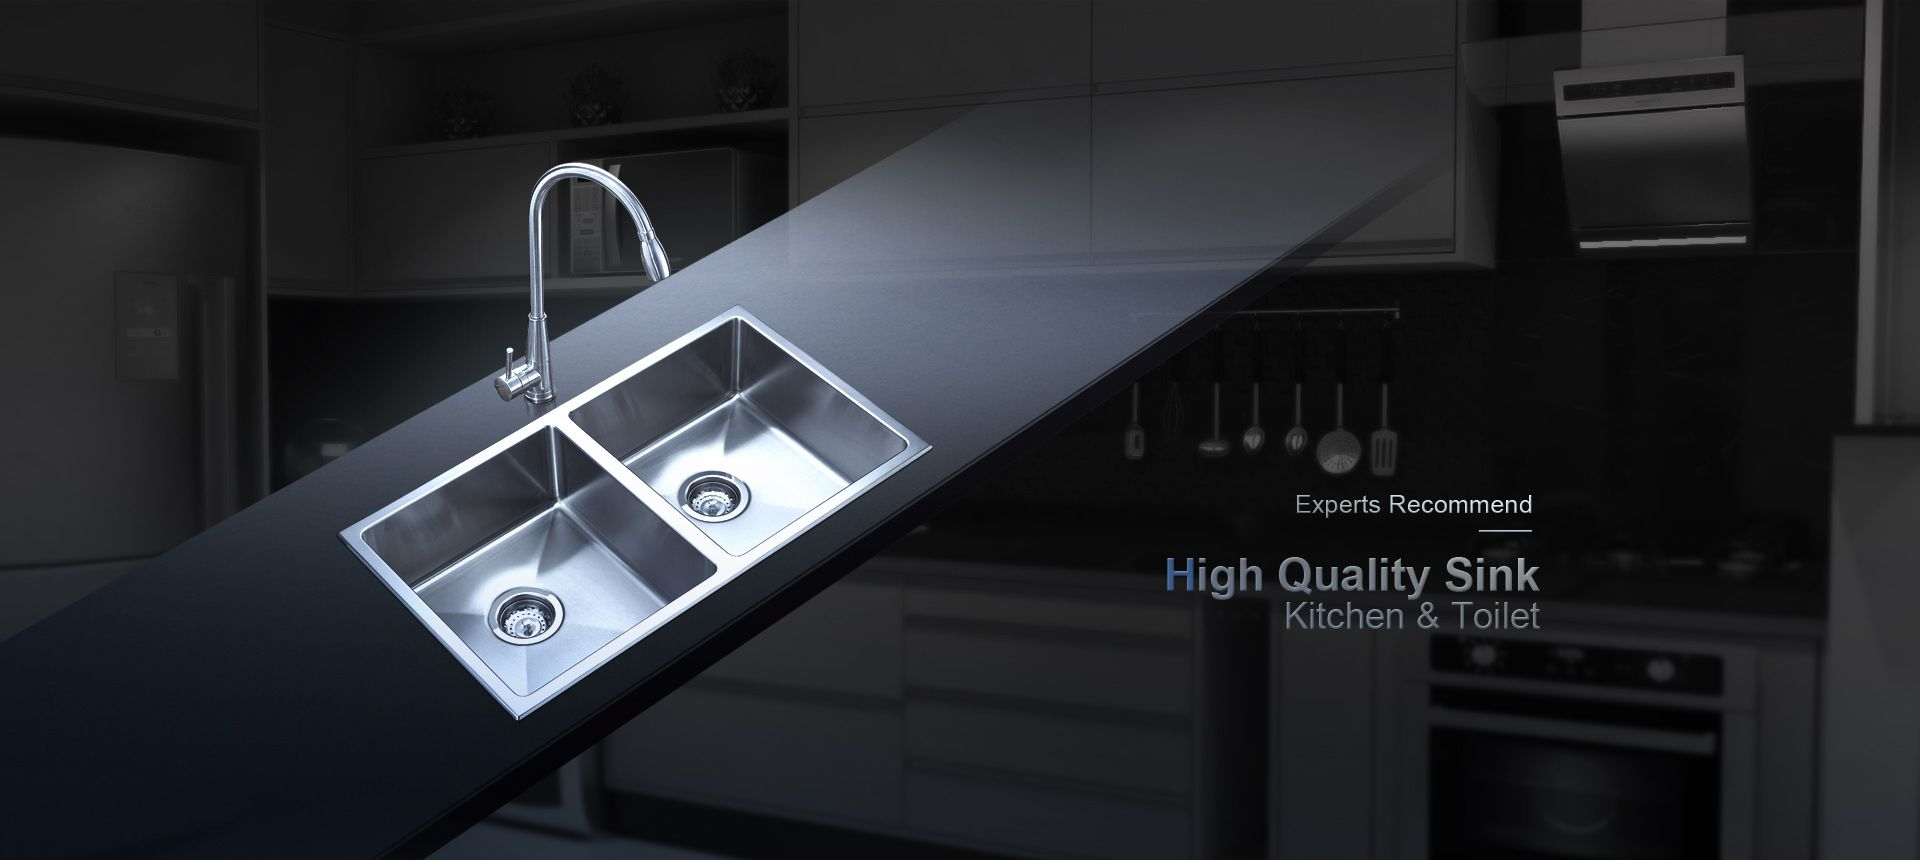 afa stainless steel sink is so beautiful | afa stainless steel sink ...